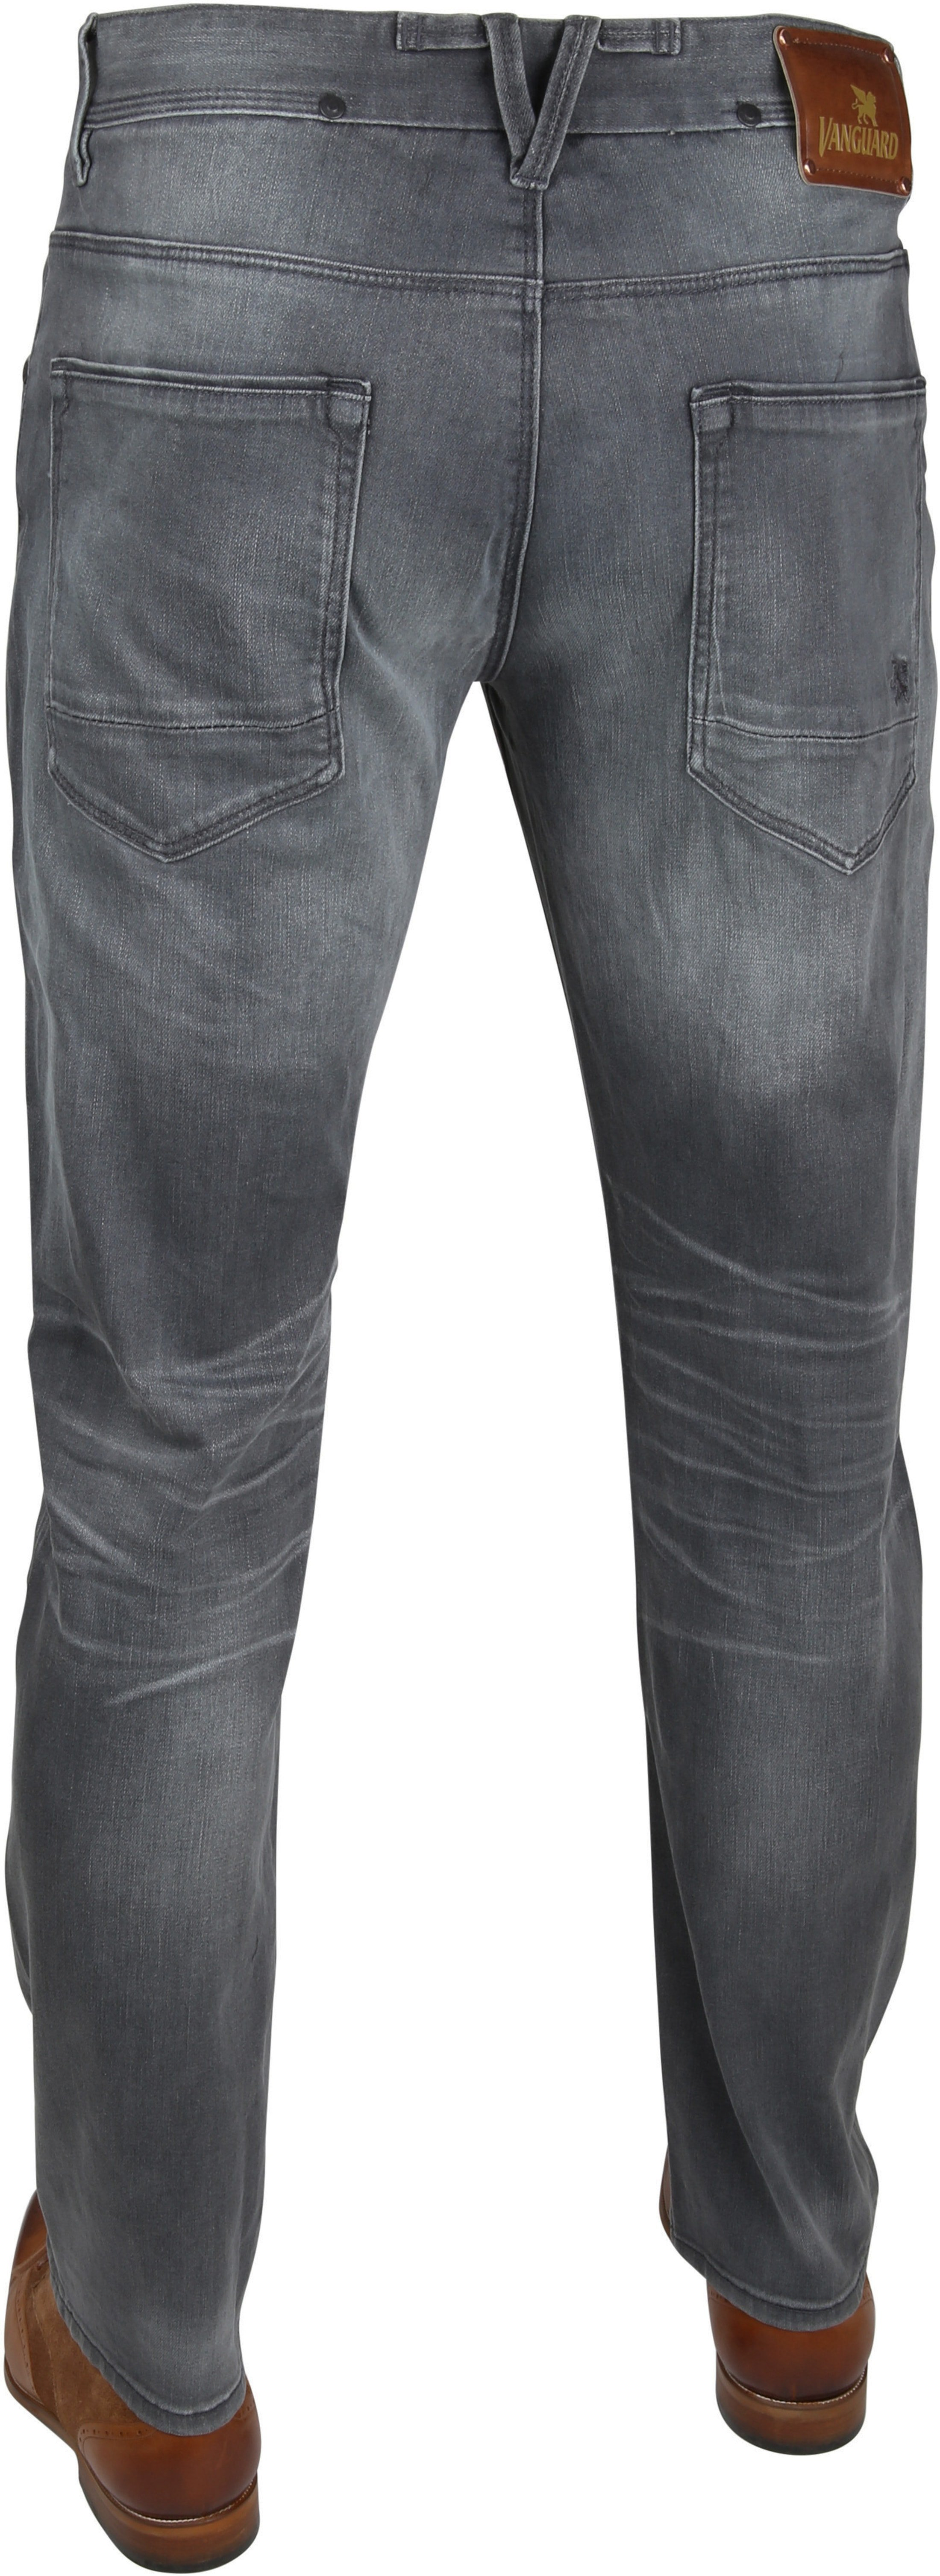 Vanguard V7 Rider Jeans Dunkelgrau foto 3